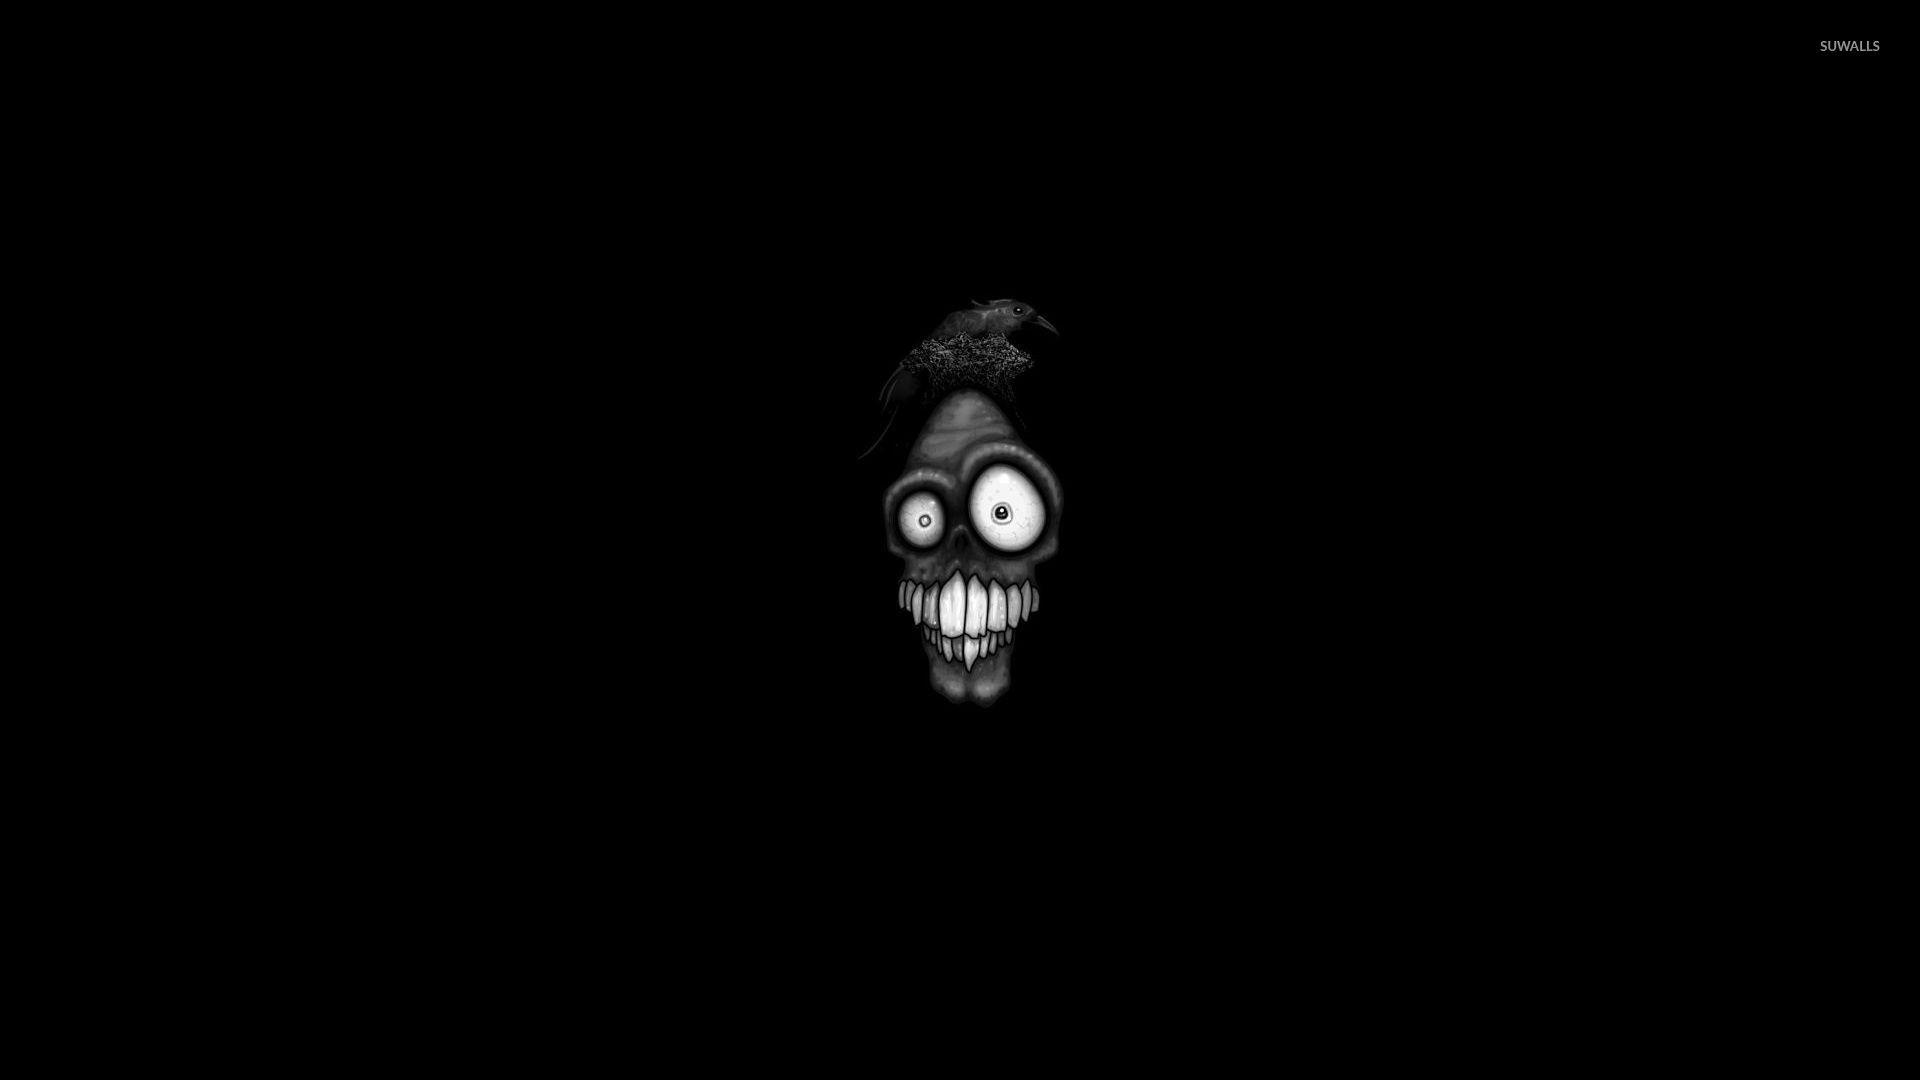 Scary 3d Live Wallpaper Skull Wallpaper 1920x1080 183 ①